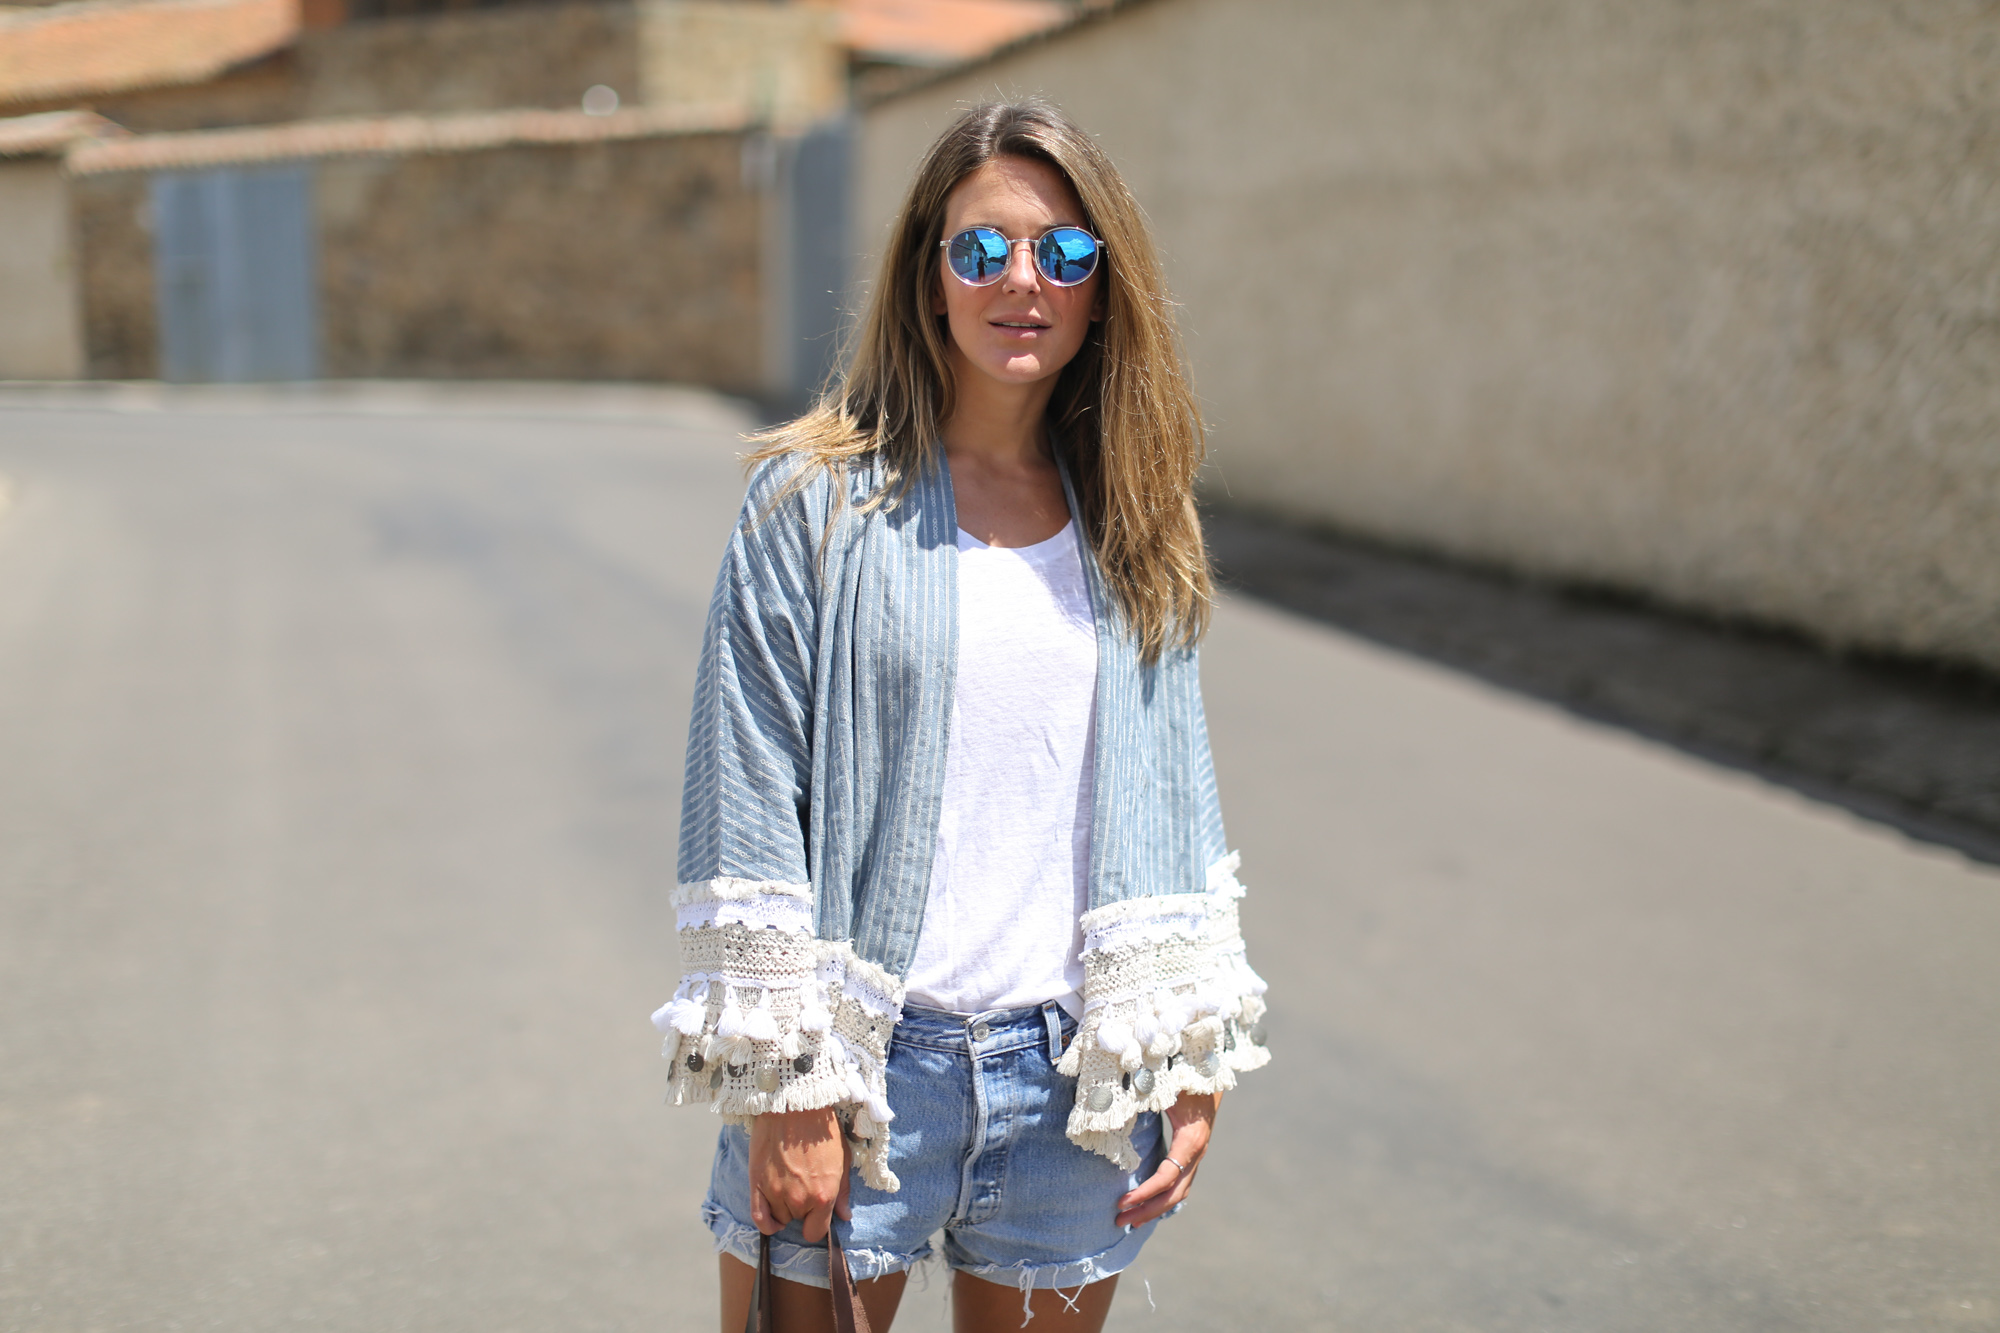 Clochet_streetstyle_zara_ethnic_kimono_jacket_suede_espadrilles_levis501-5